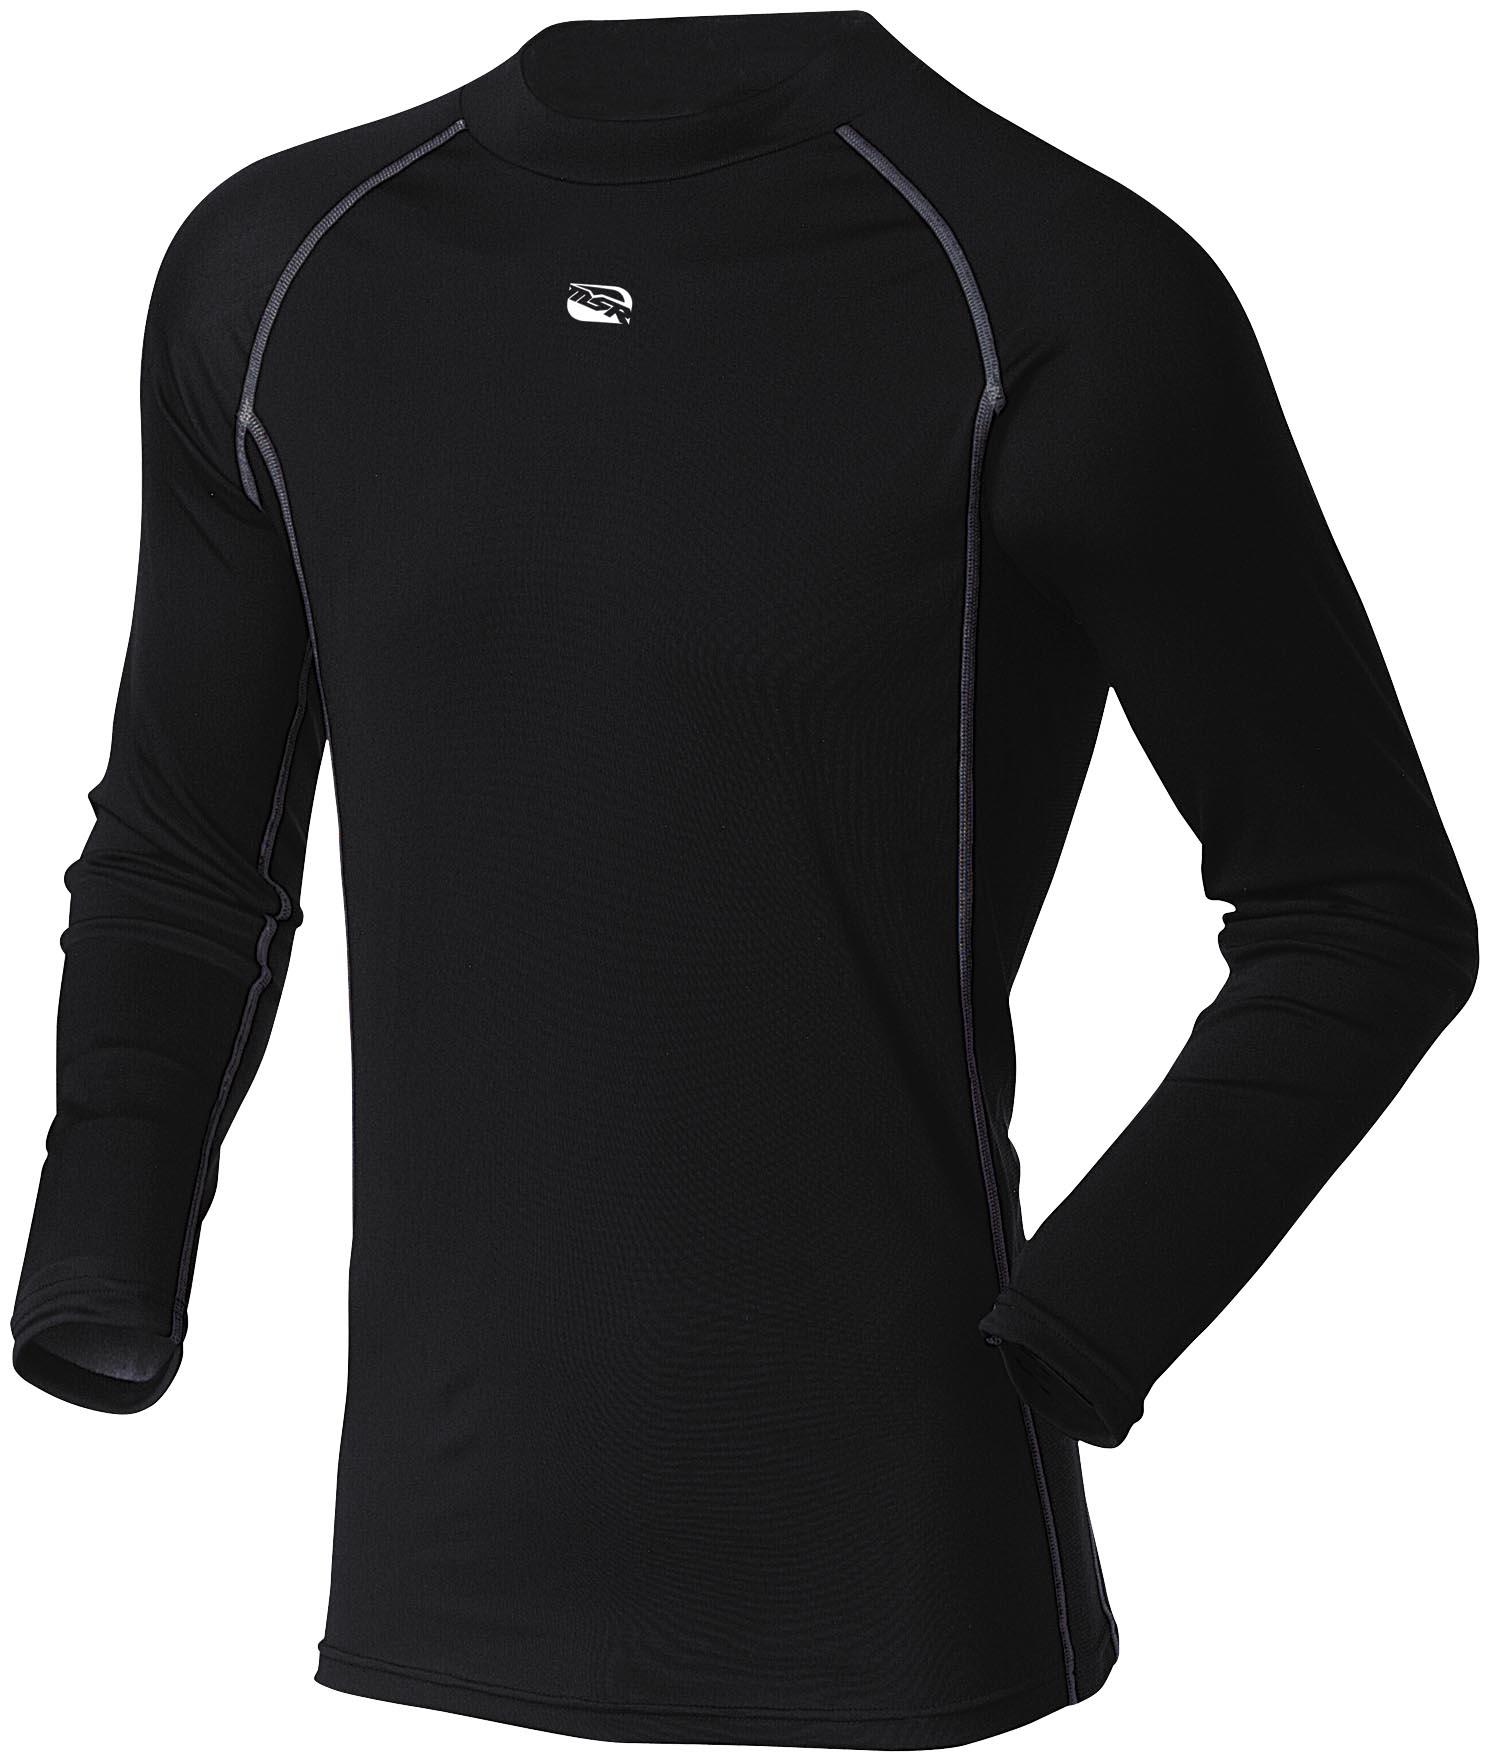 Base Layer Long Sleeve Shirt